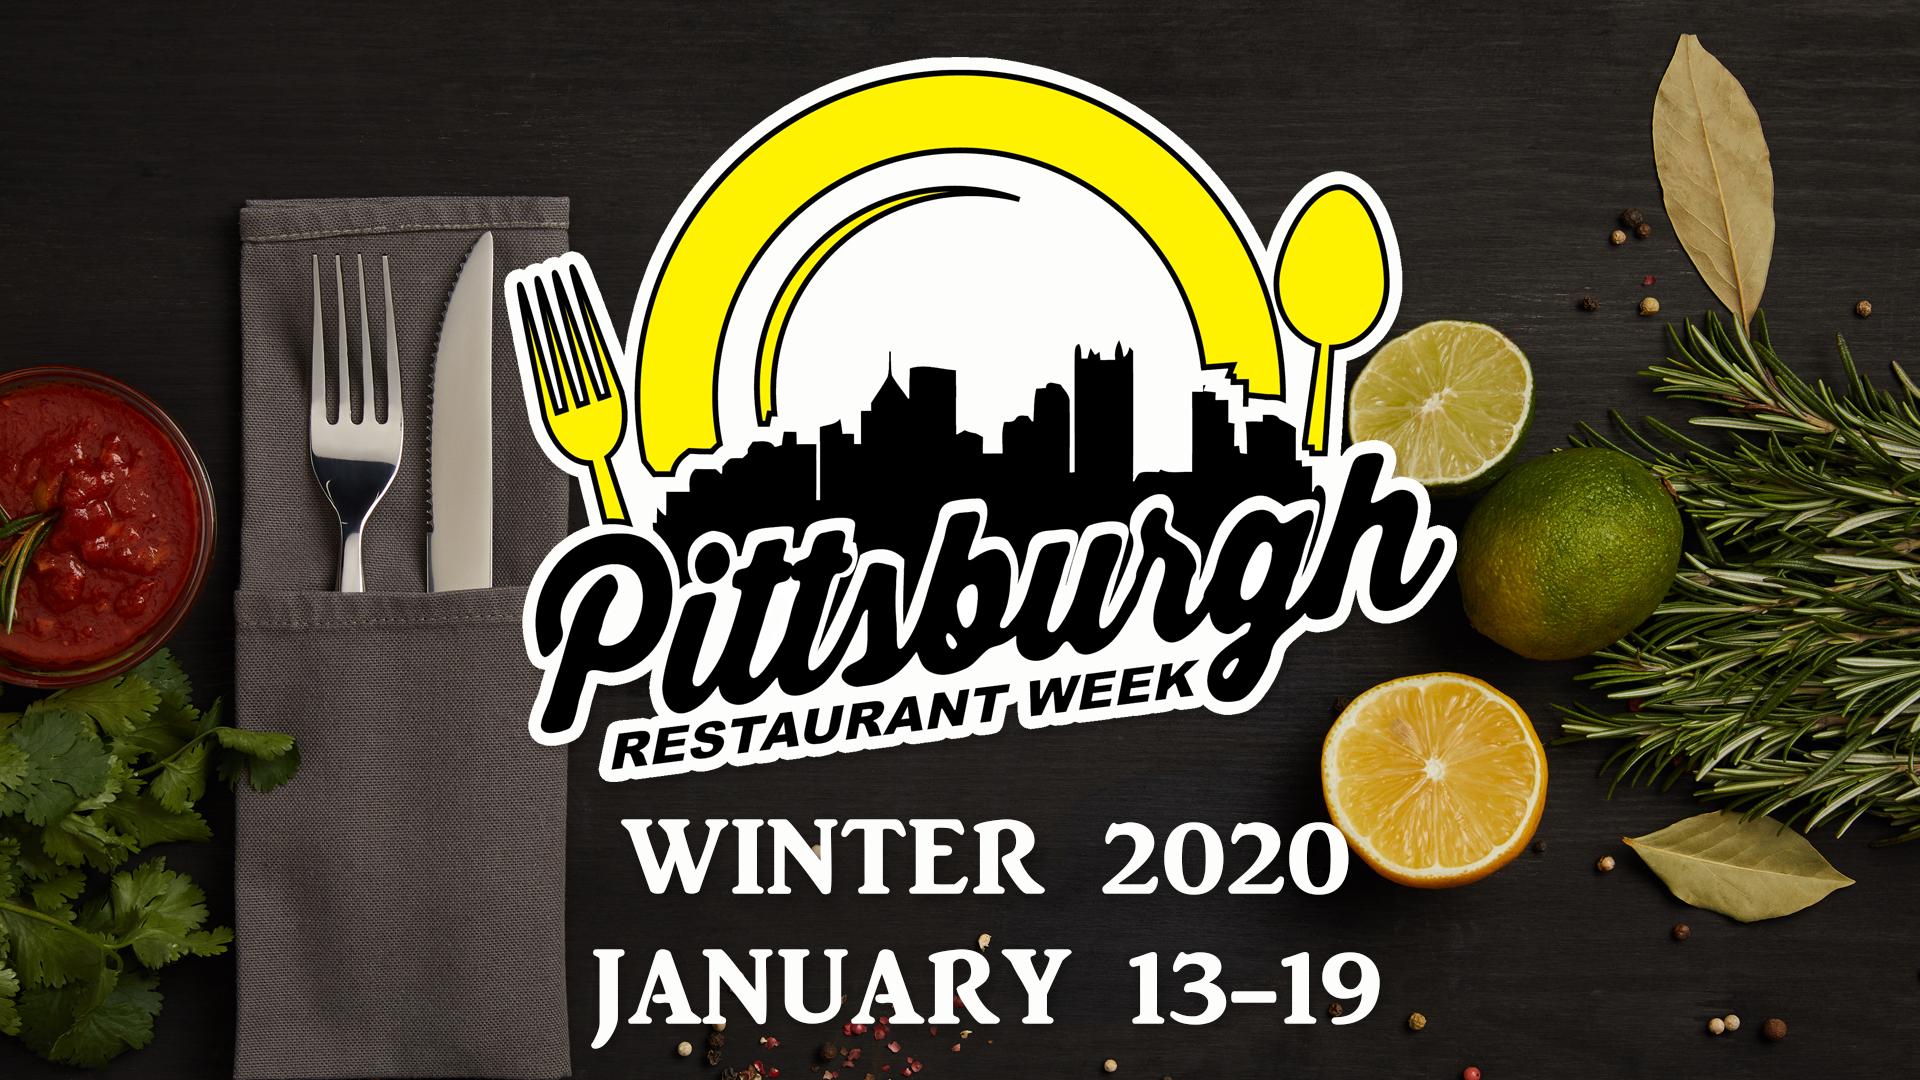 Pittsburgh Restaurant Week Winter 2020